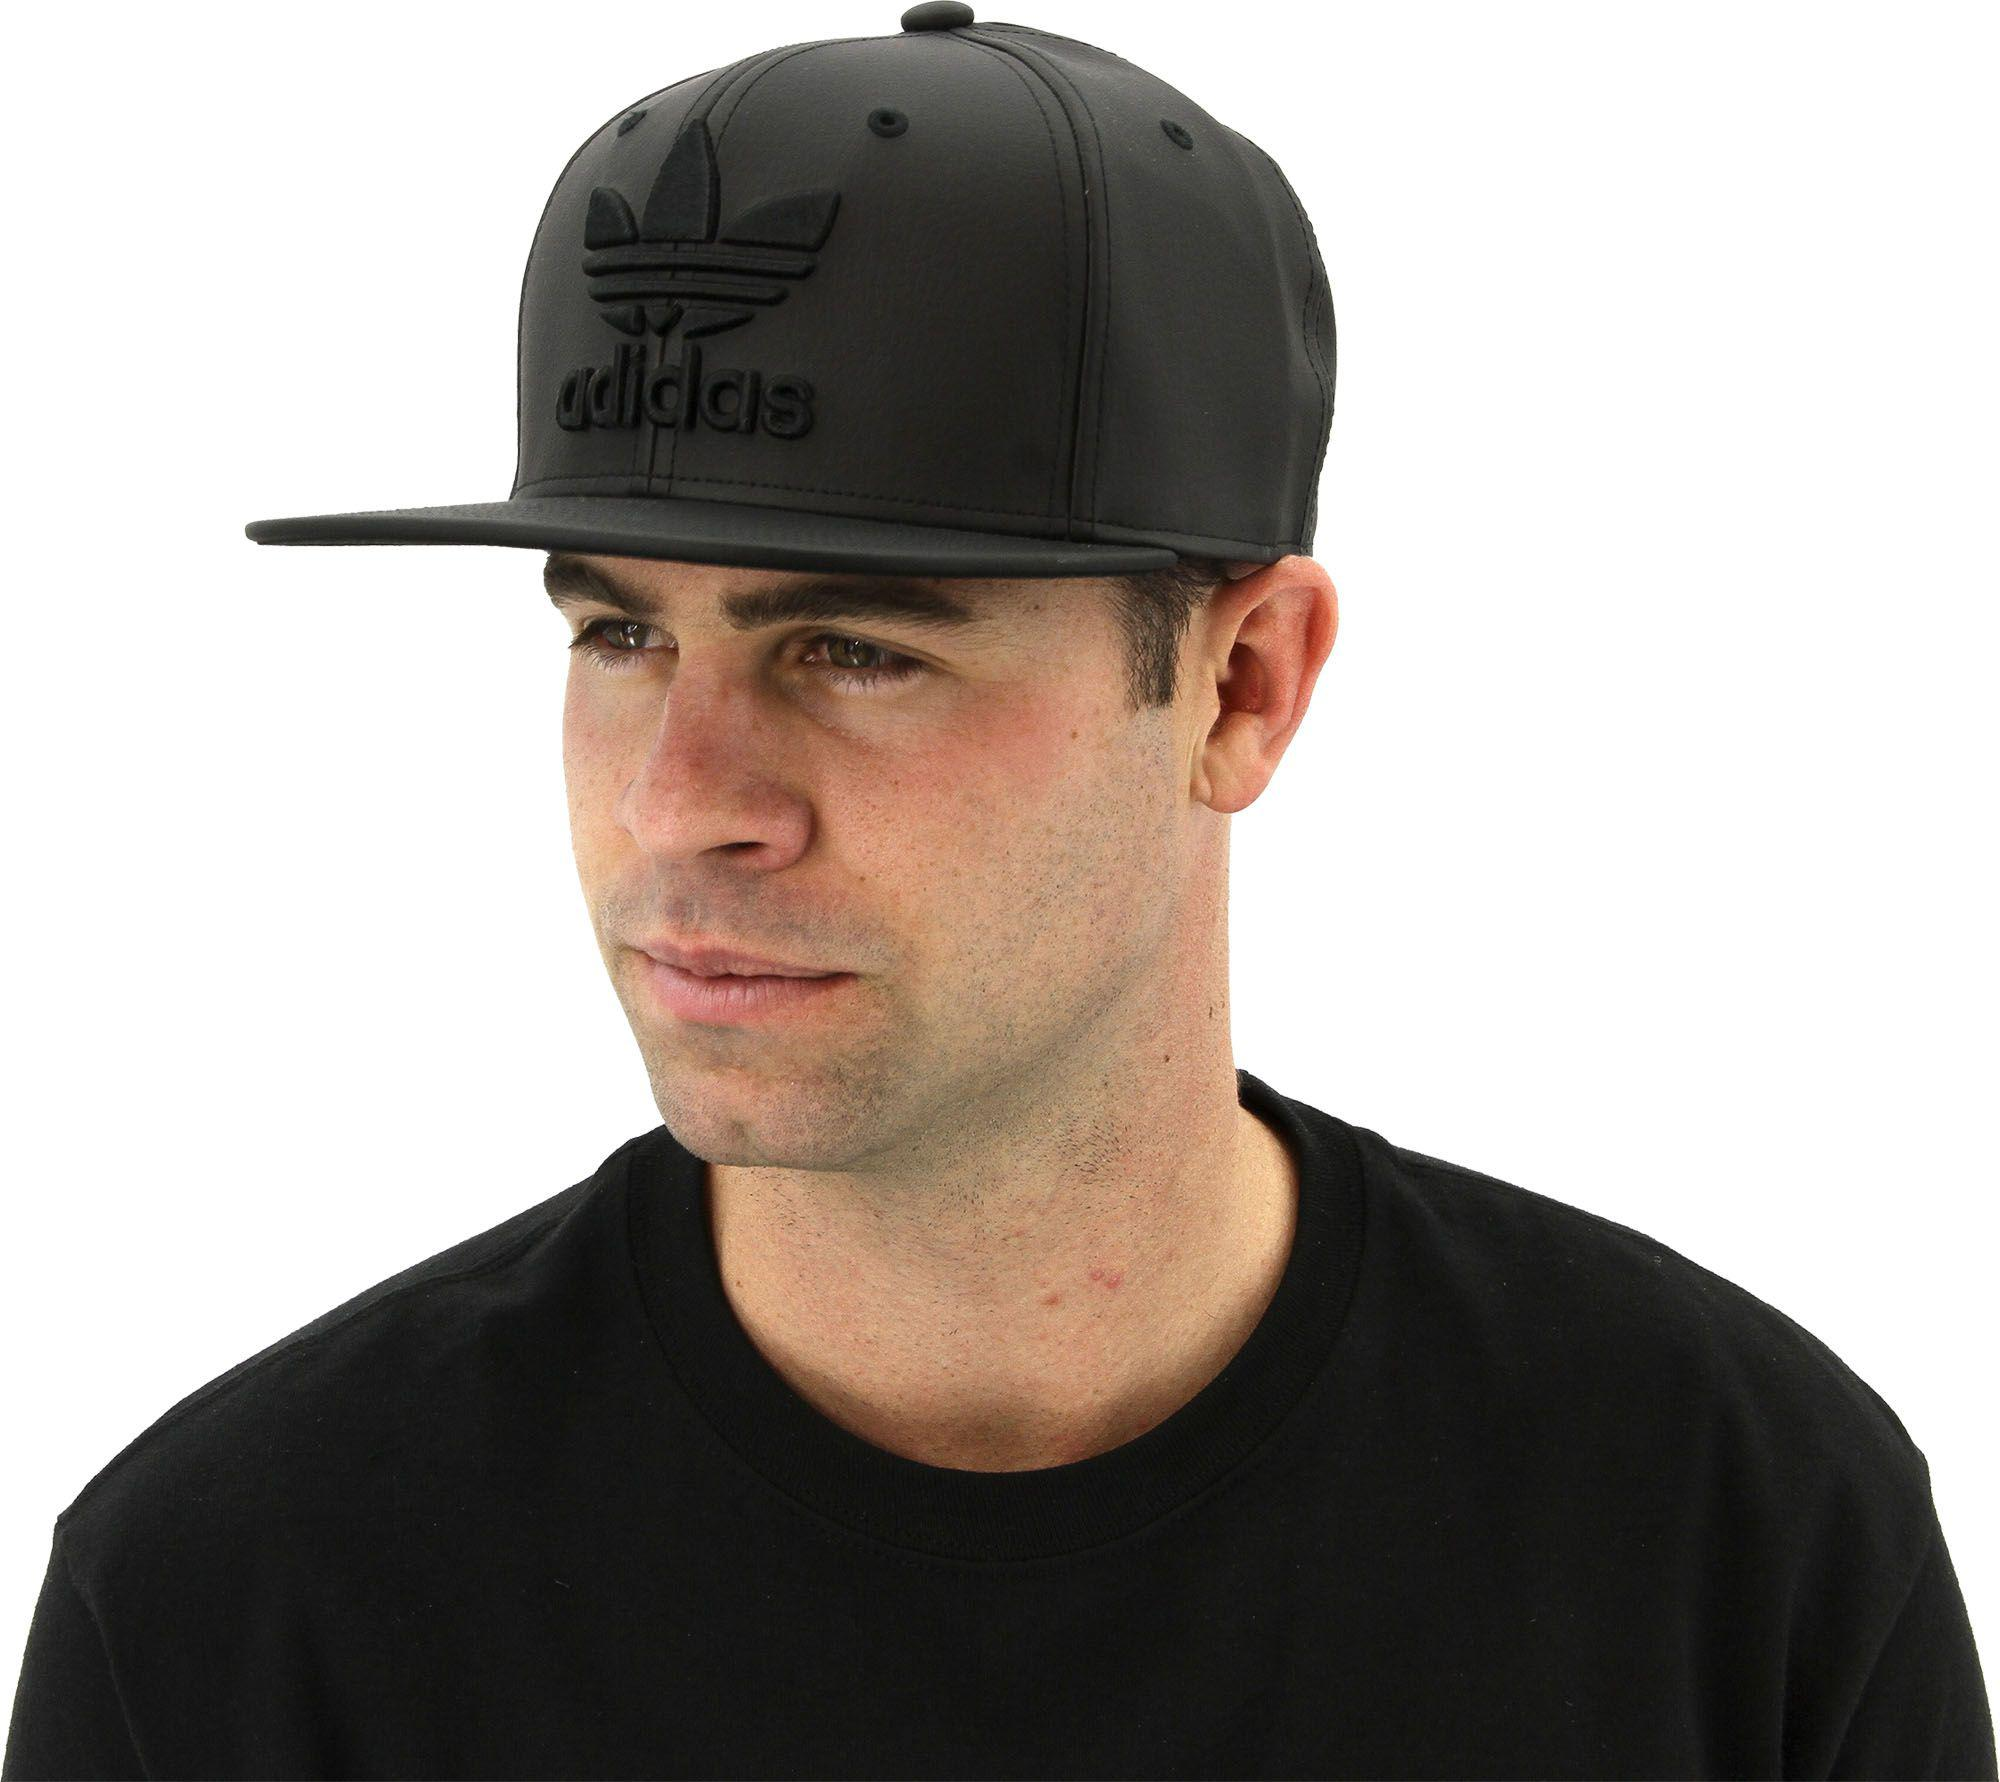 Lyst - adidas Originals Trefoil Plus Snapback Hat in Black for Men a1f21e5ebc7